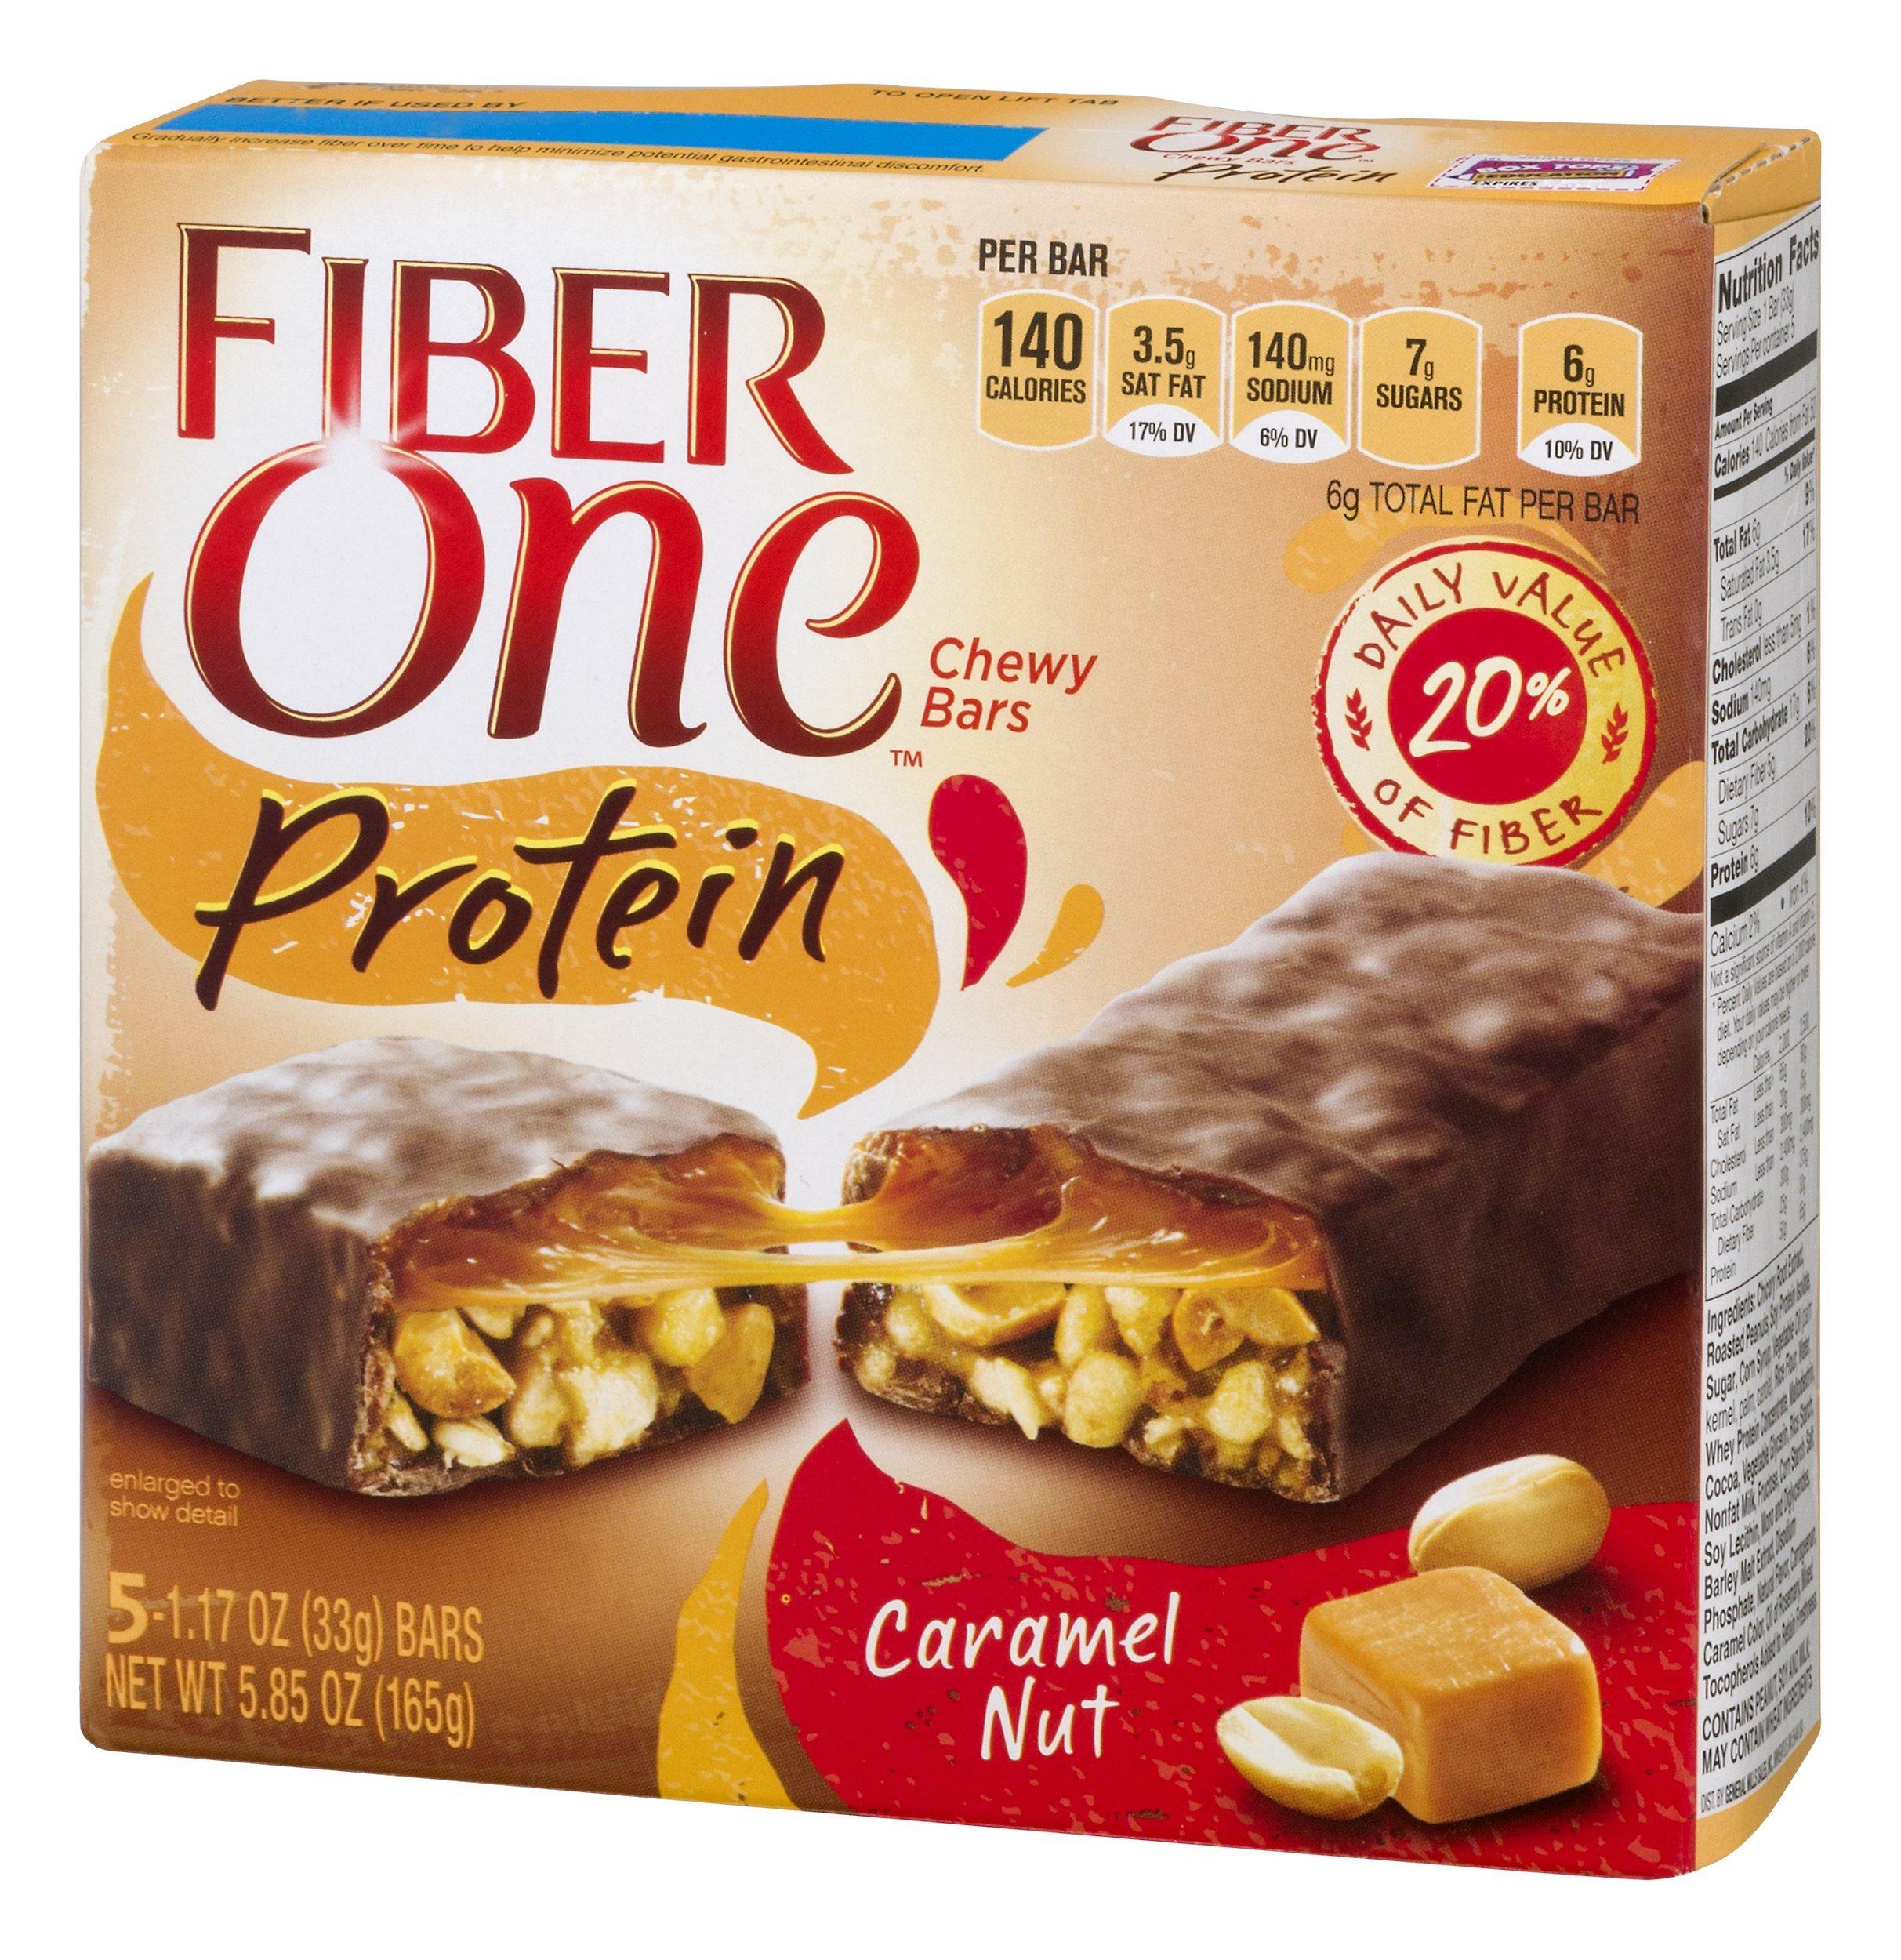 Fiber One Protein Bar, Caramel Nut Chewy Bars, 5 Fiber Bars, 5.85 oz by Fiber One